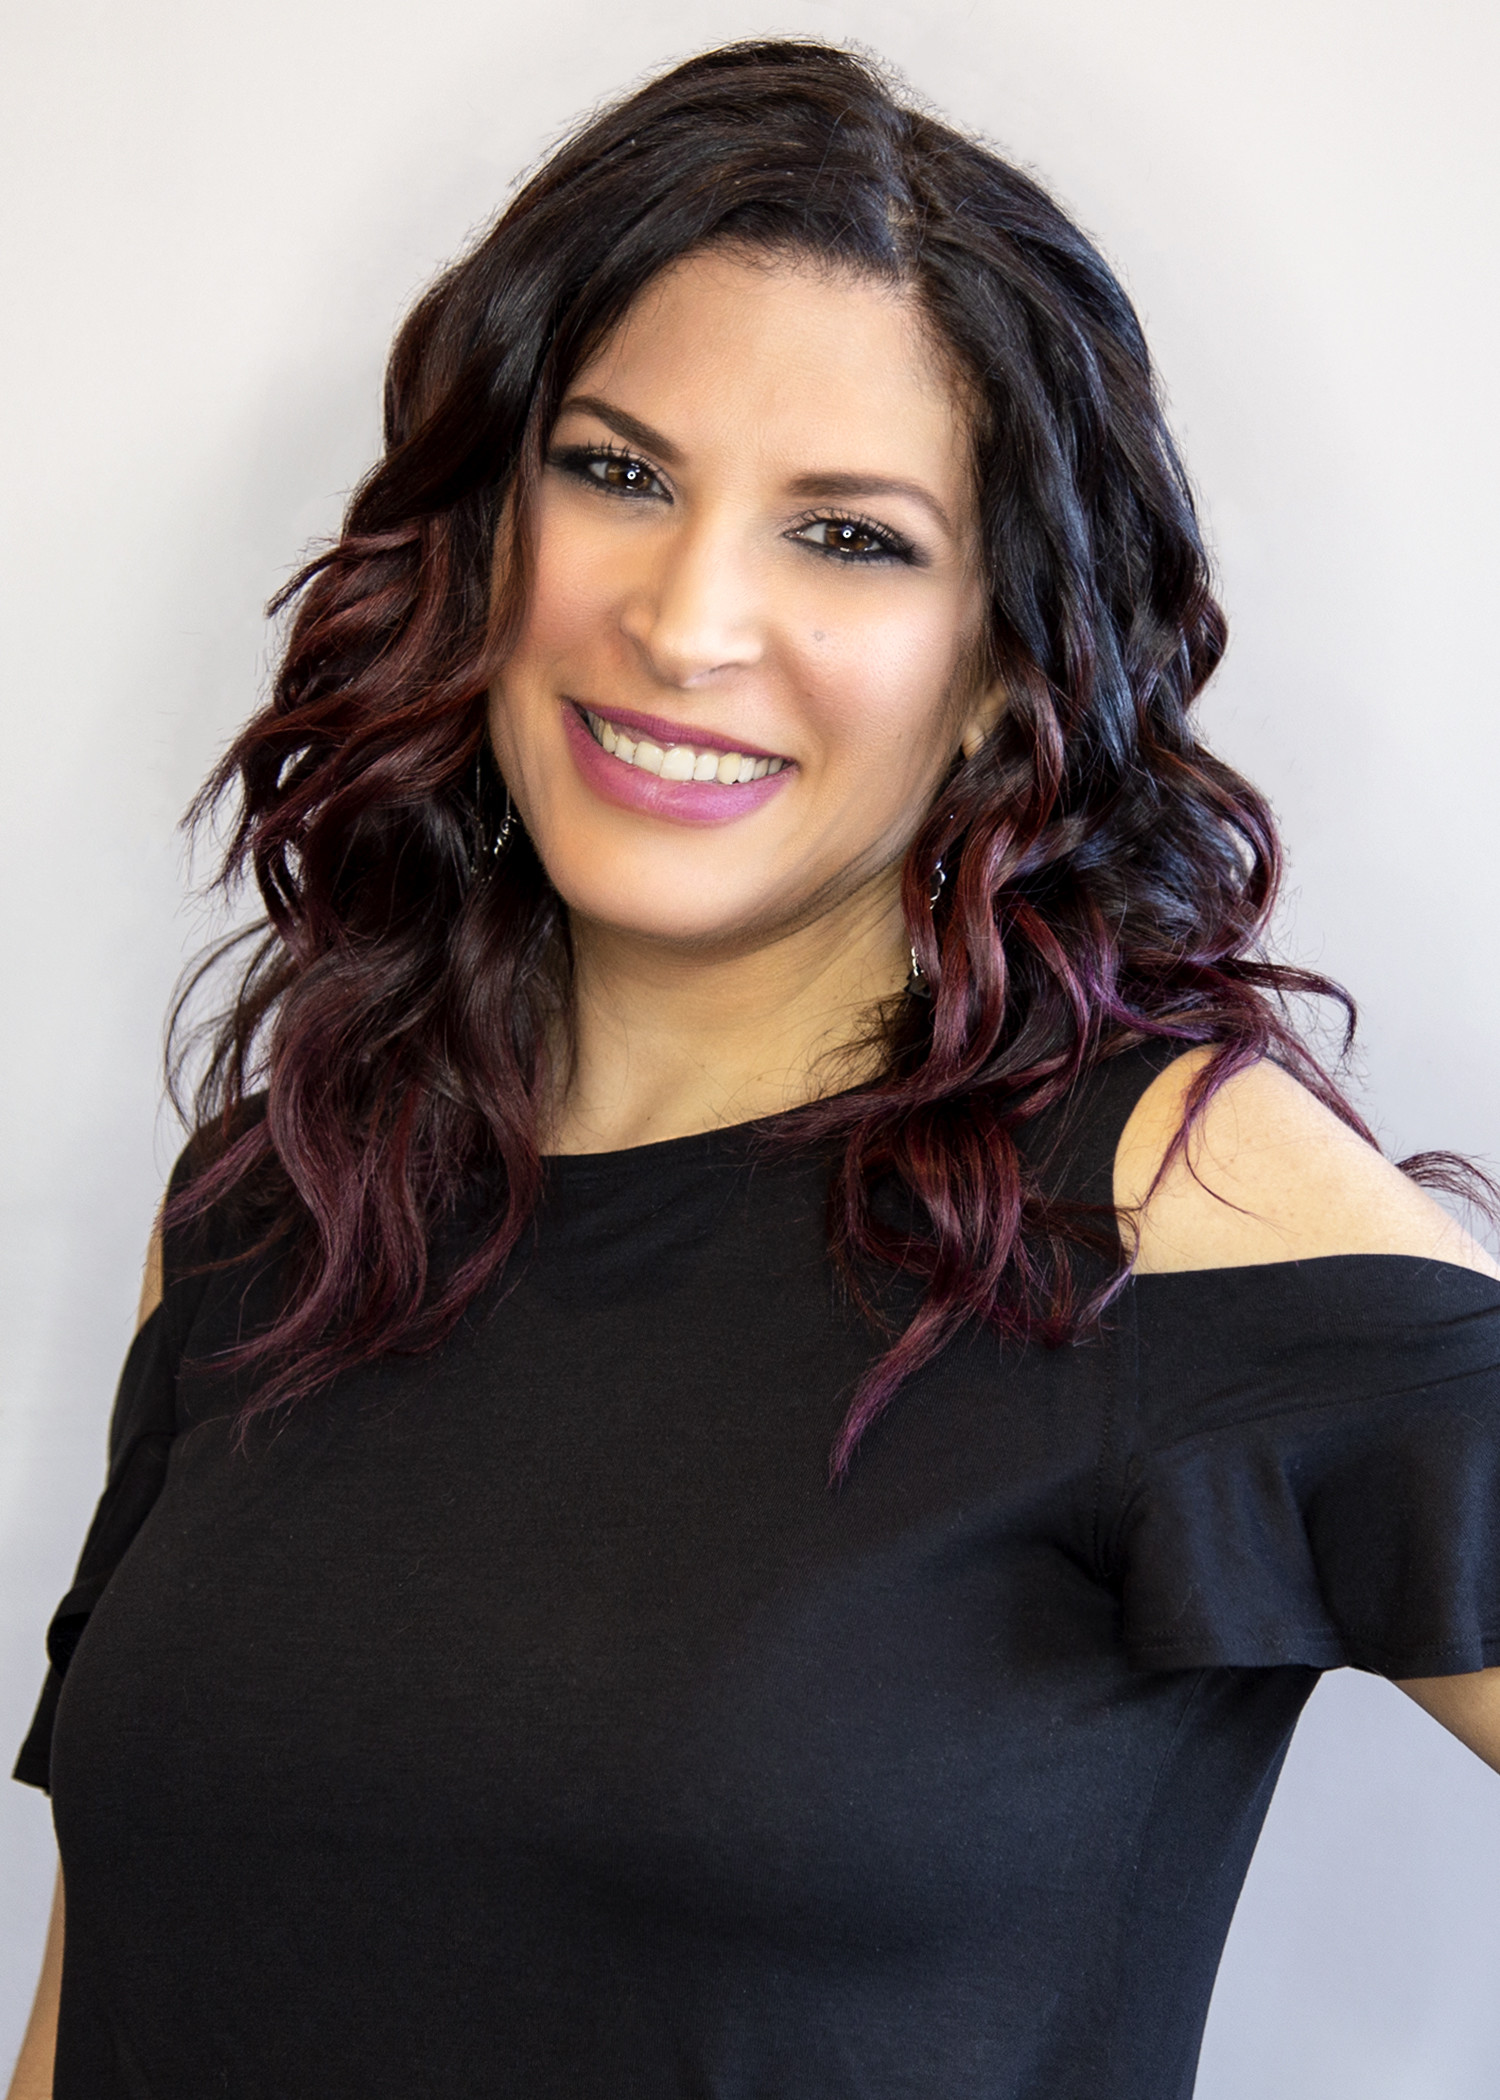 Tina - Salon Brielle - Long Island Hair Salon